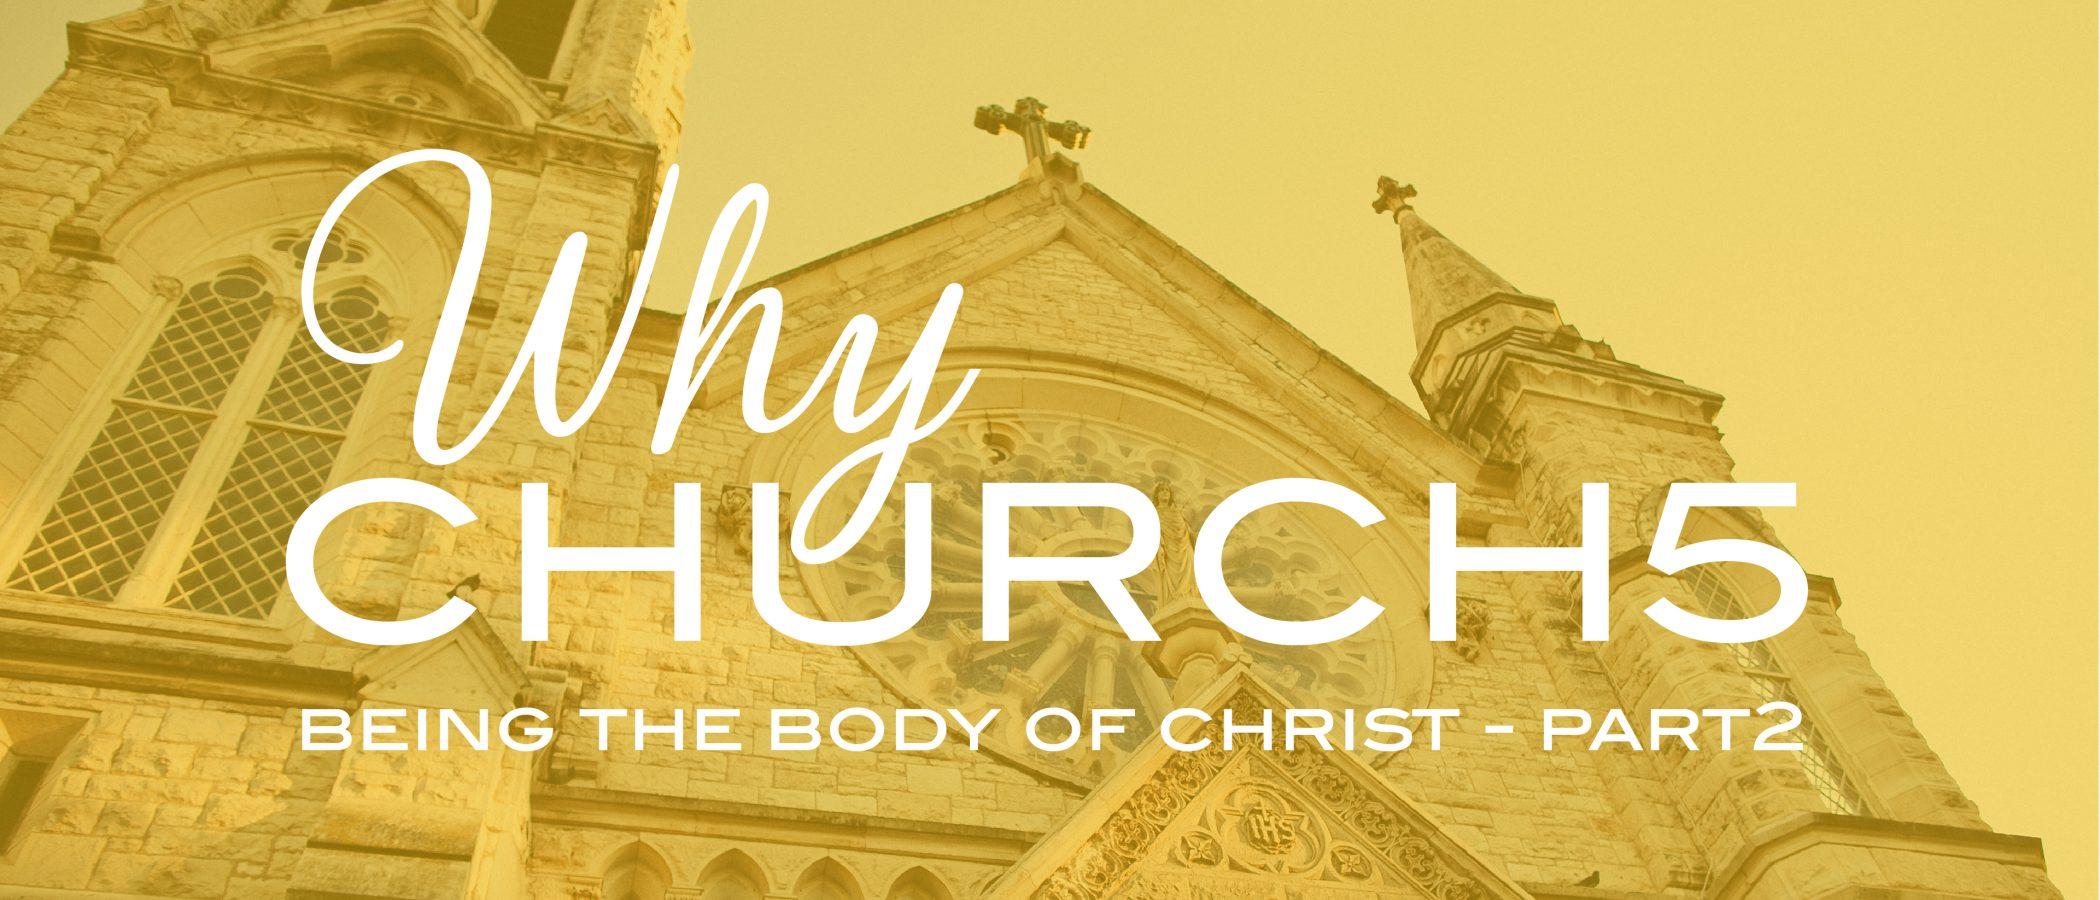 why-church-series-dq11brd-dq2021-why-church5-being-the-body-of-christ-part22x-100